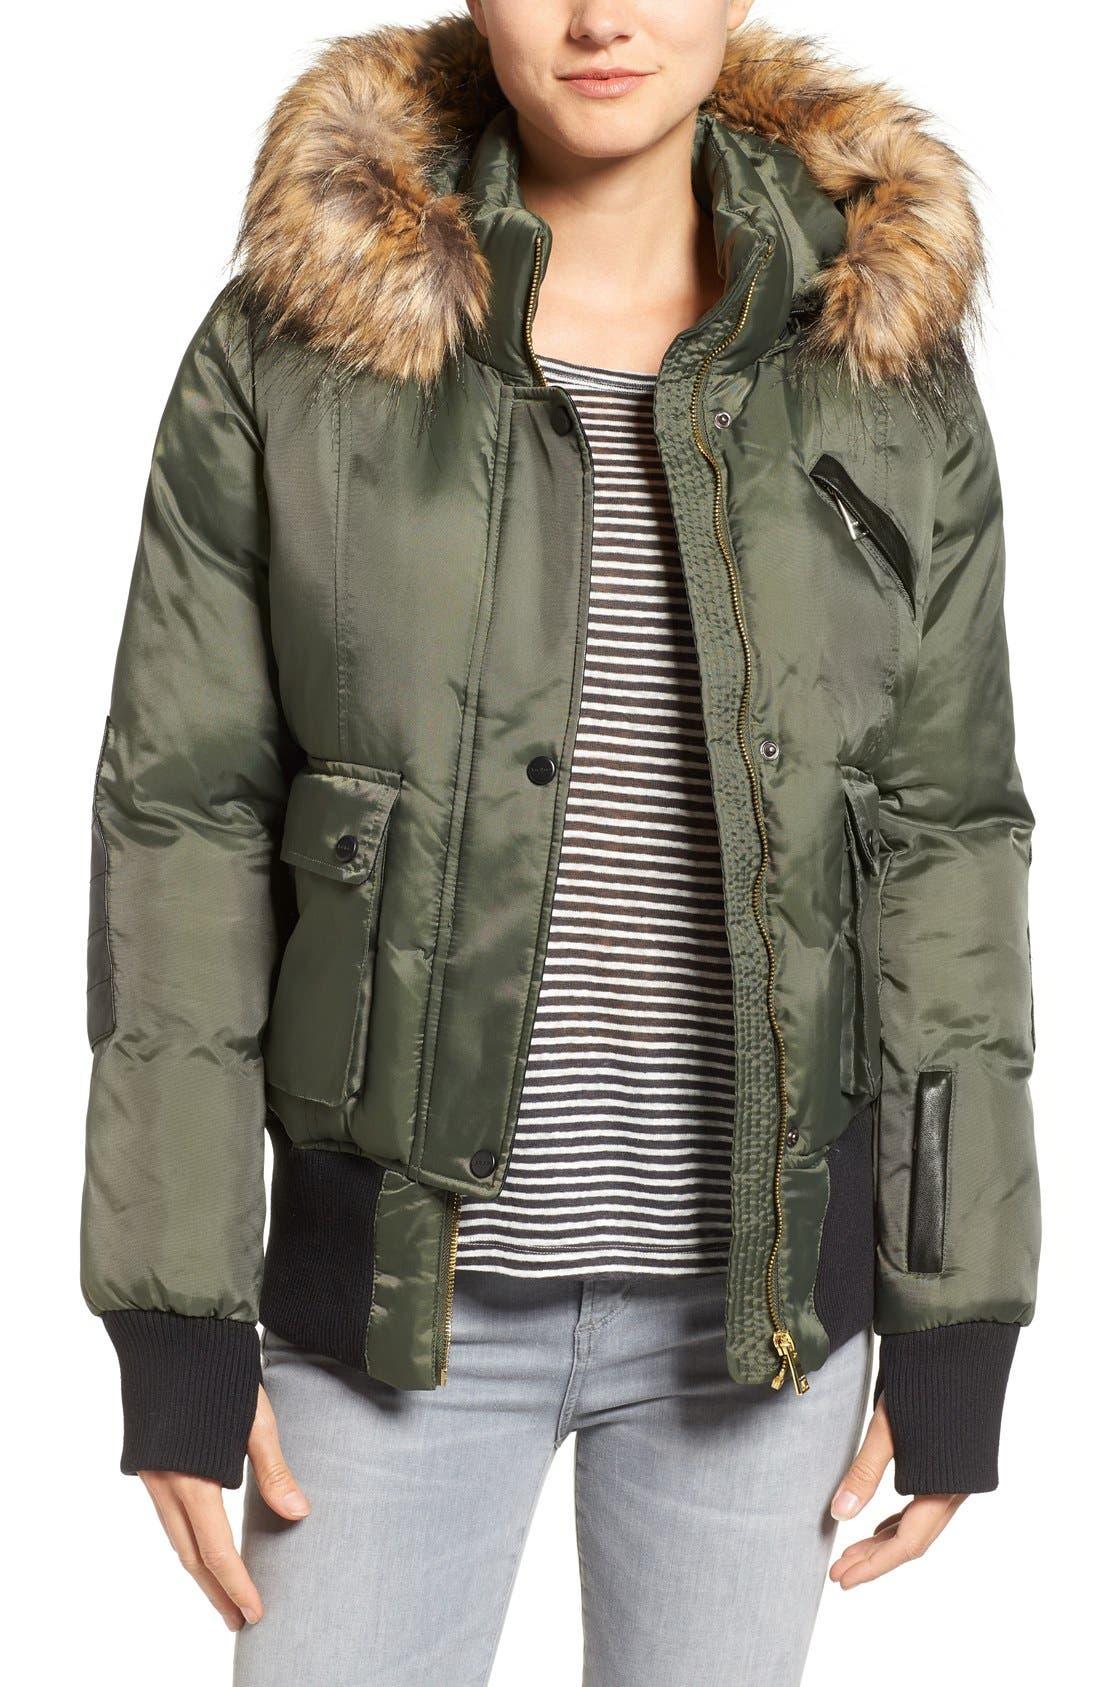 Main Image - bebe Faux Leather & Faux Fur Trim Bomber Jacket with Detachable Hood